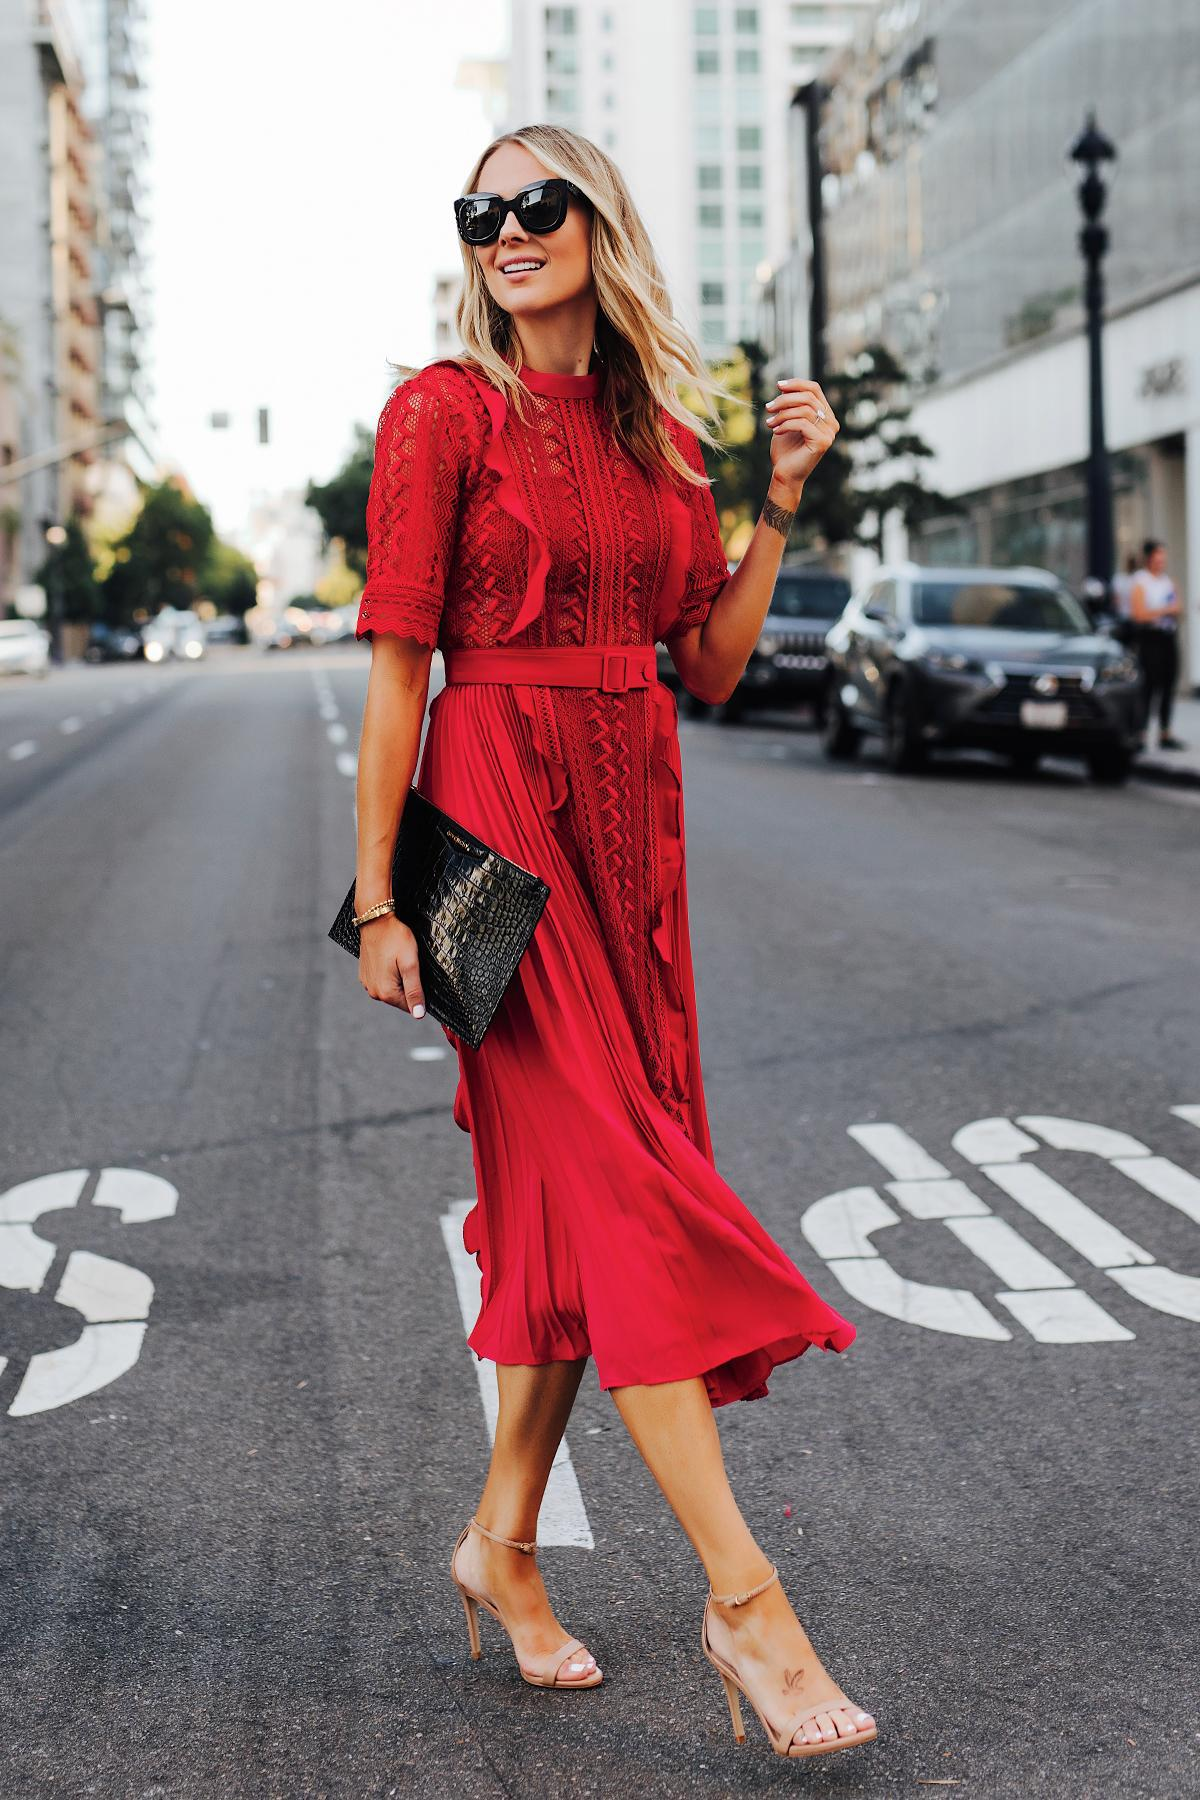 fashionjackson blogger dress bag sunglasses shoes red dress spring outfits high heel sandals clutch pleated dress sandal heels black bag